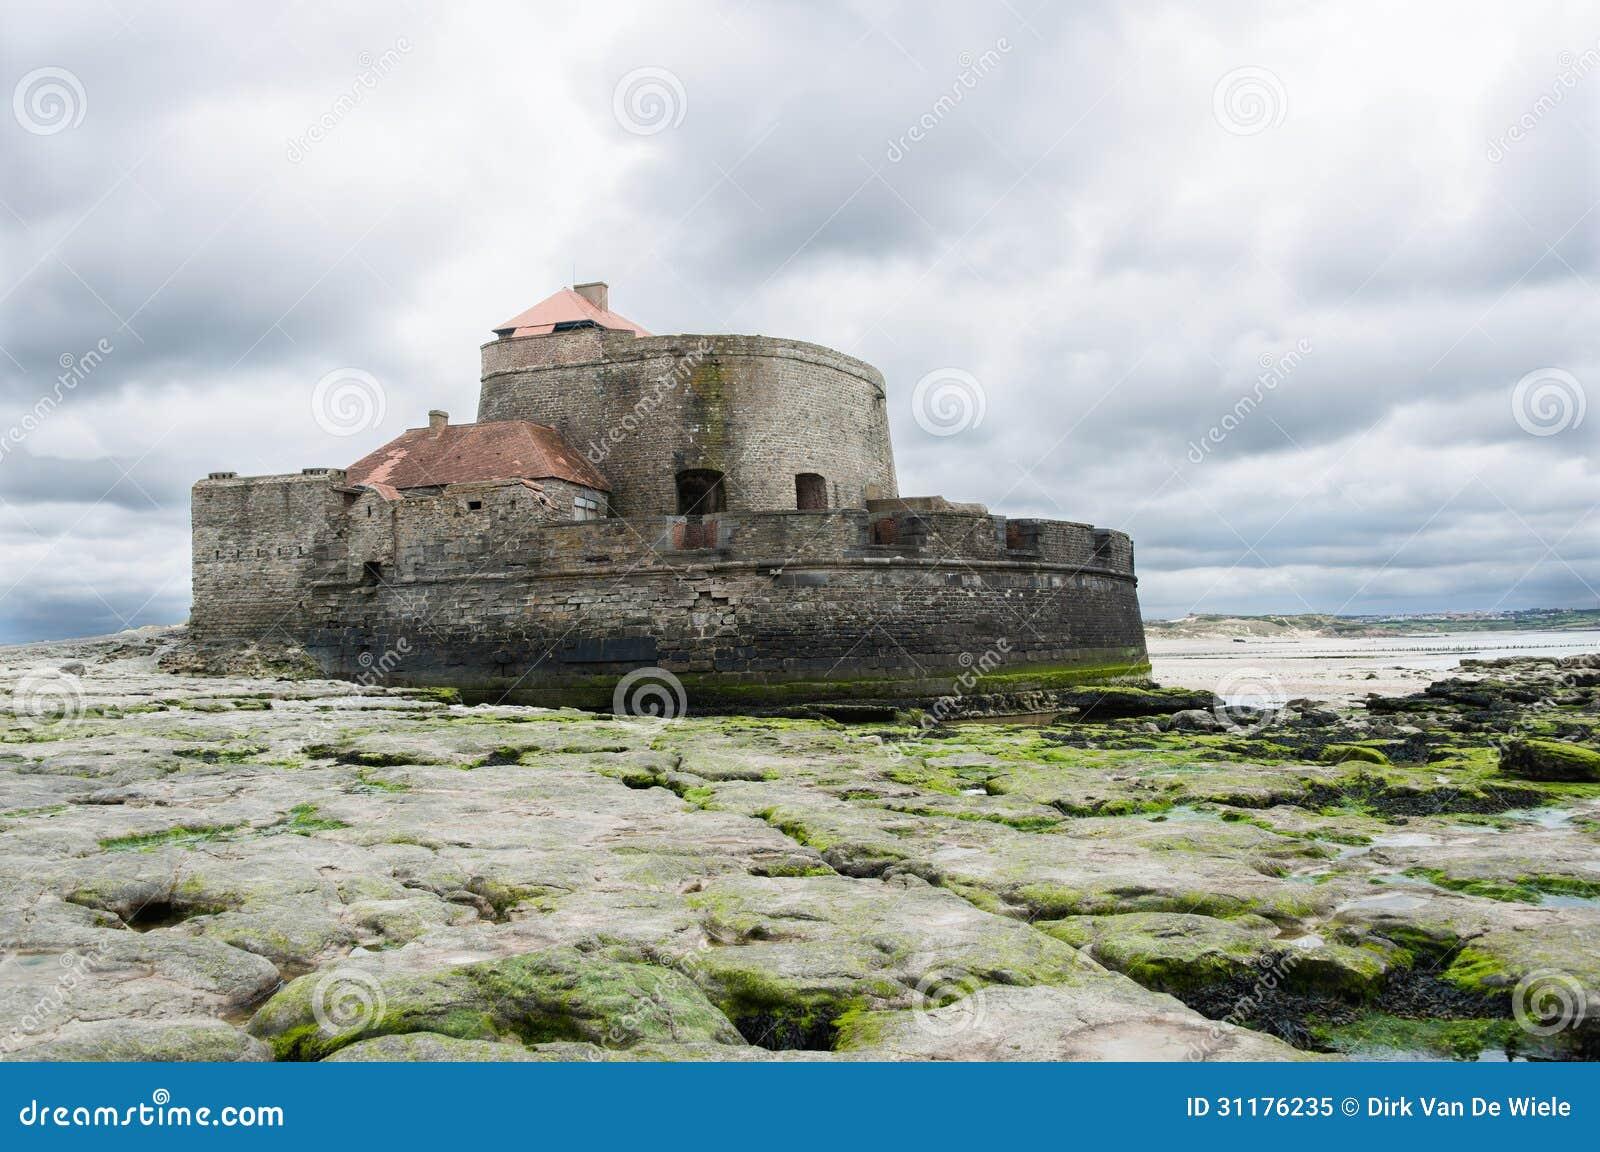 Fort Mahon Ambleteuse frontside